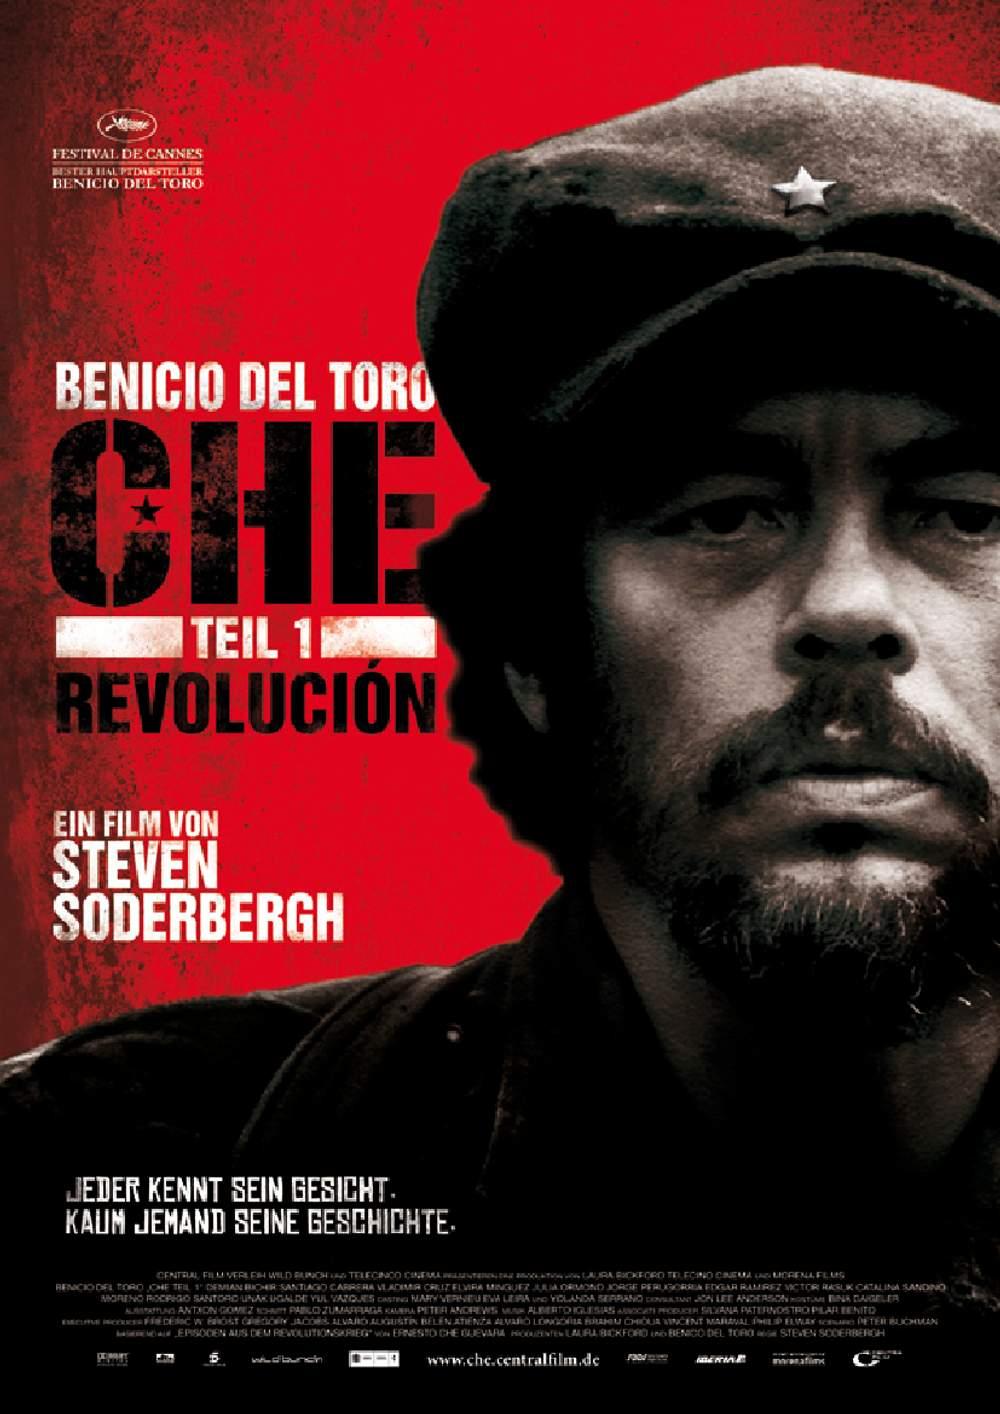 Film Che. Rewolucja